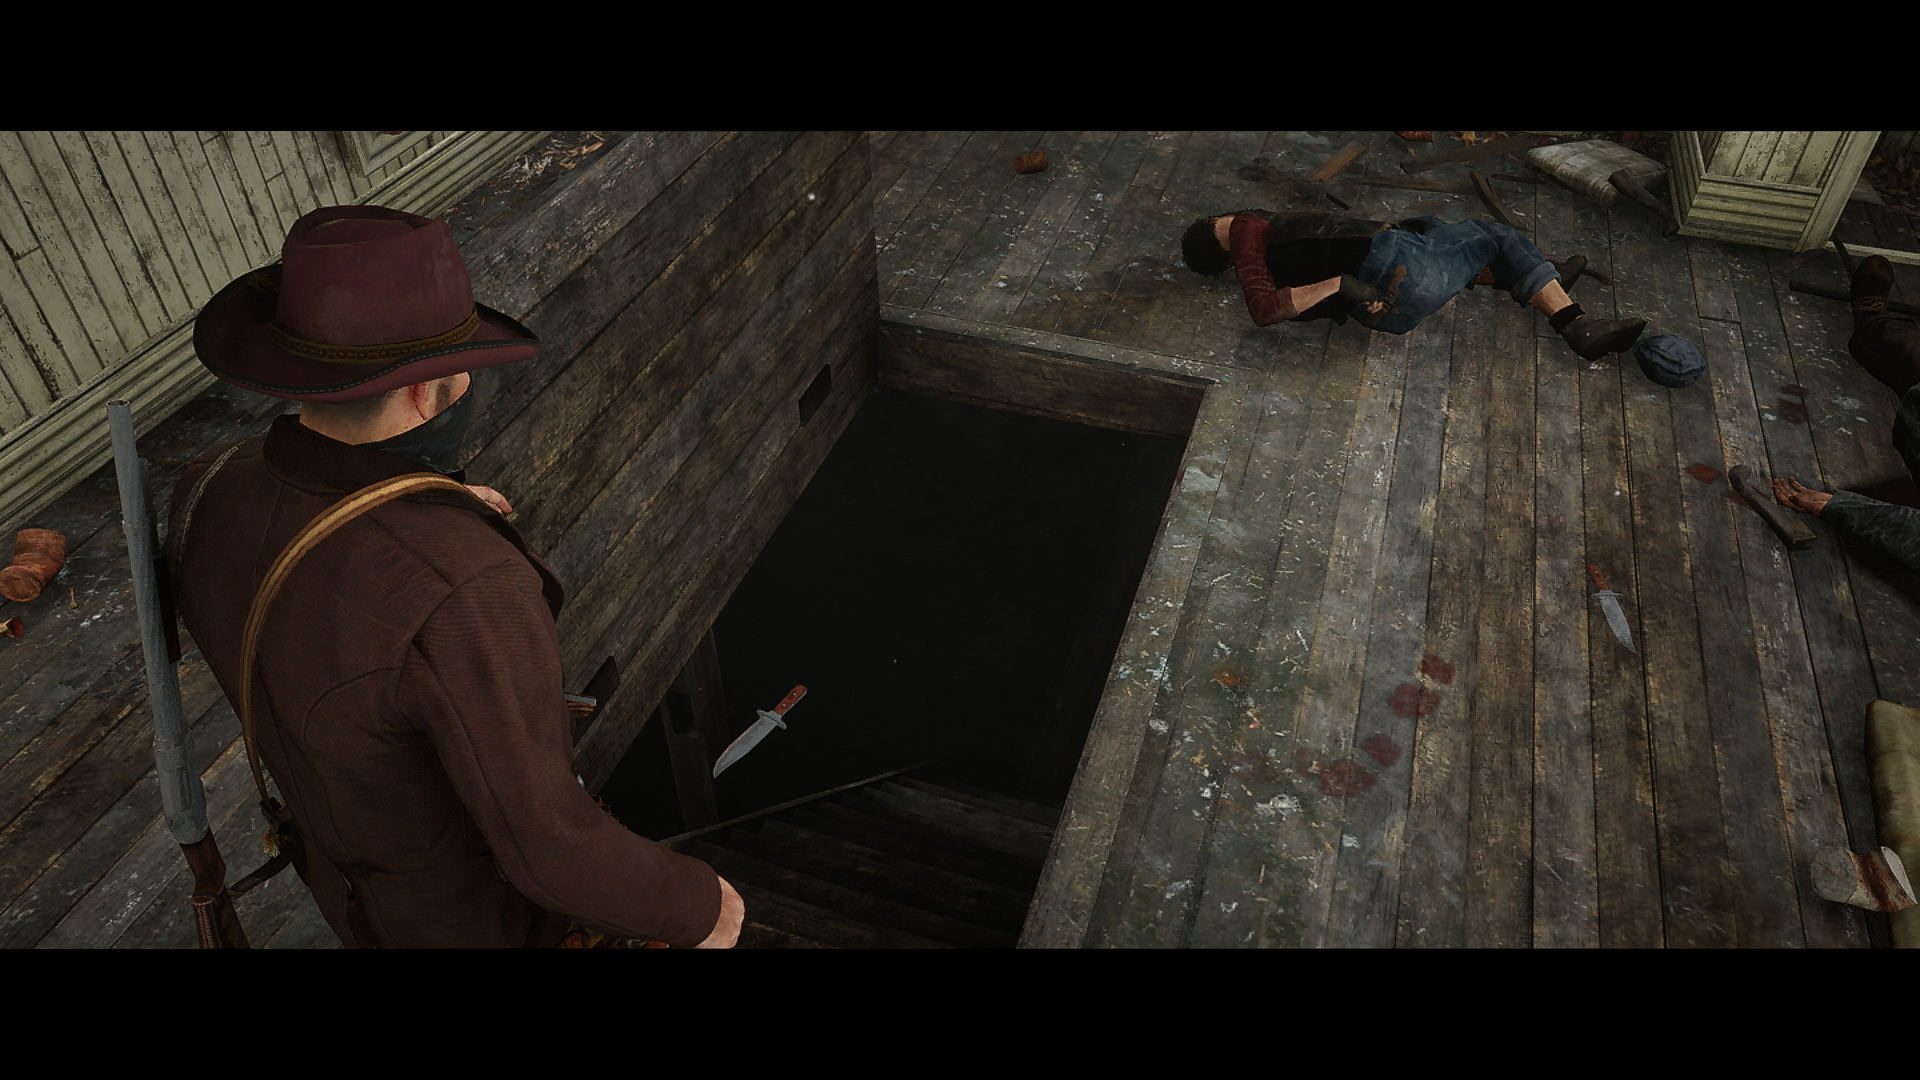 Red-Dead-Redemption-2-Screenshot-2020-08